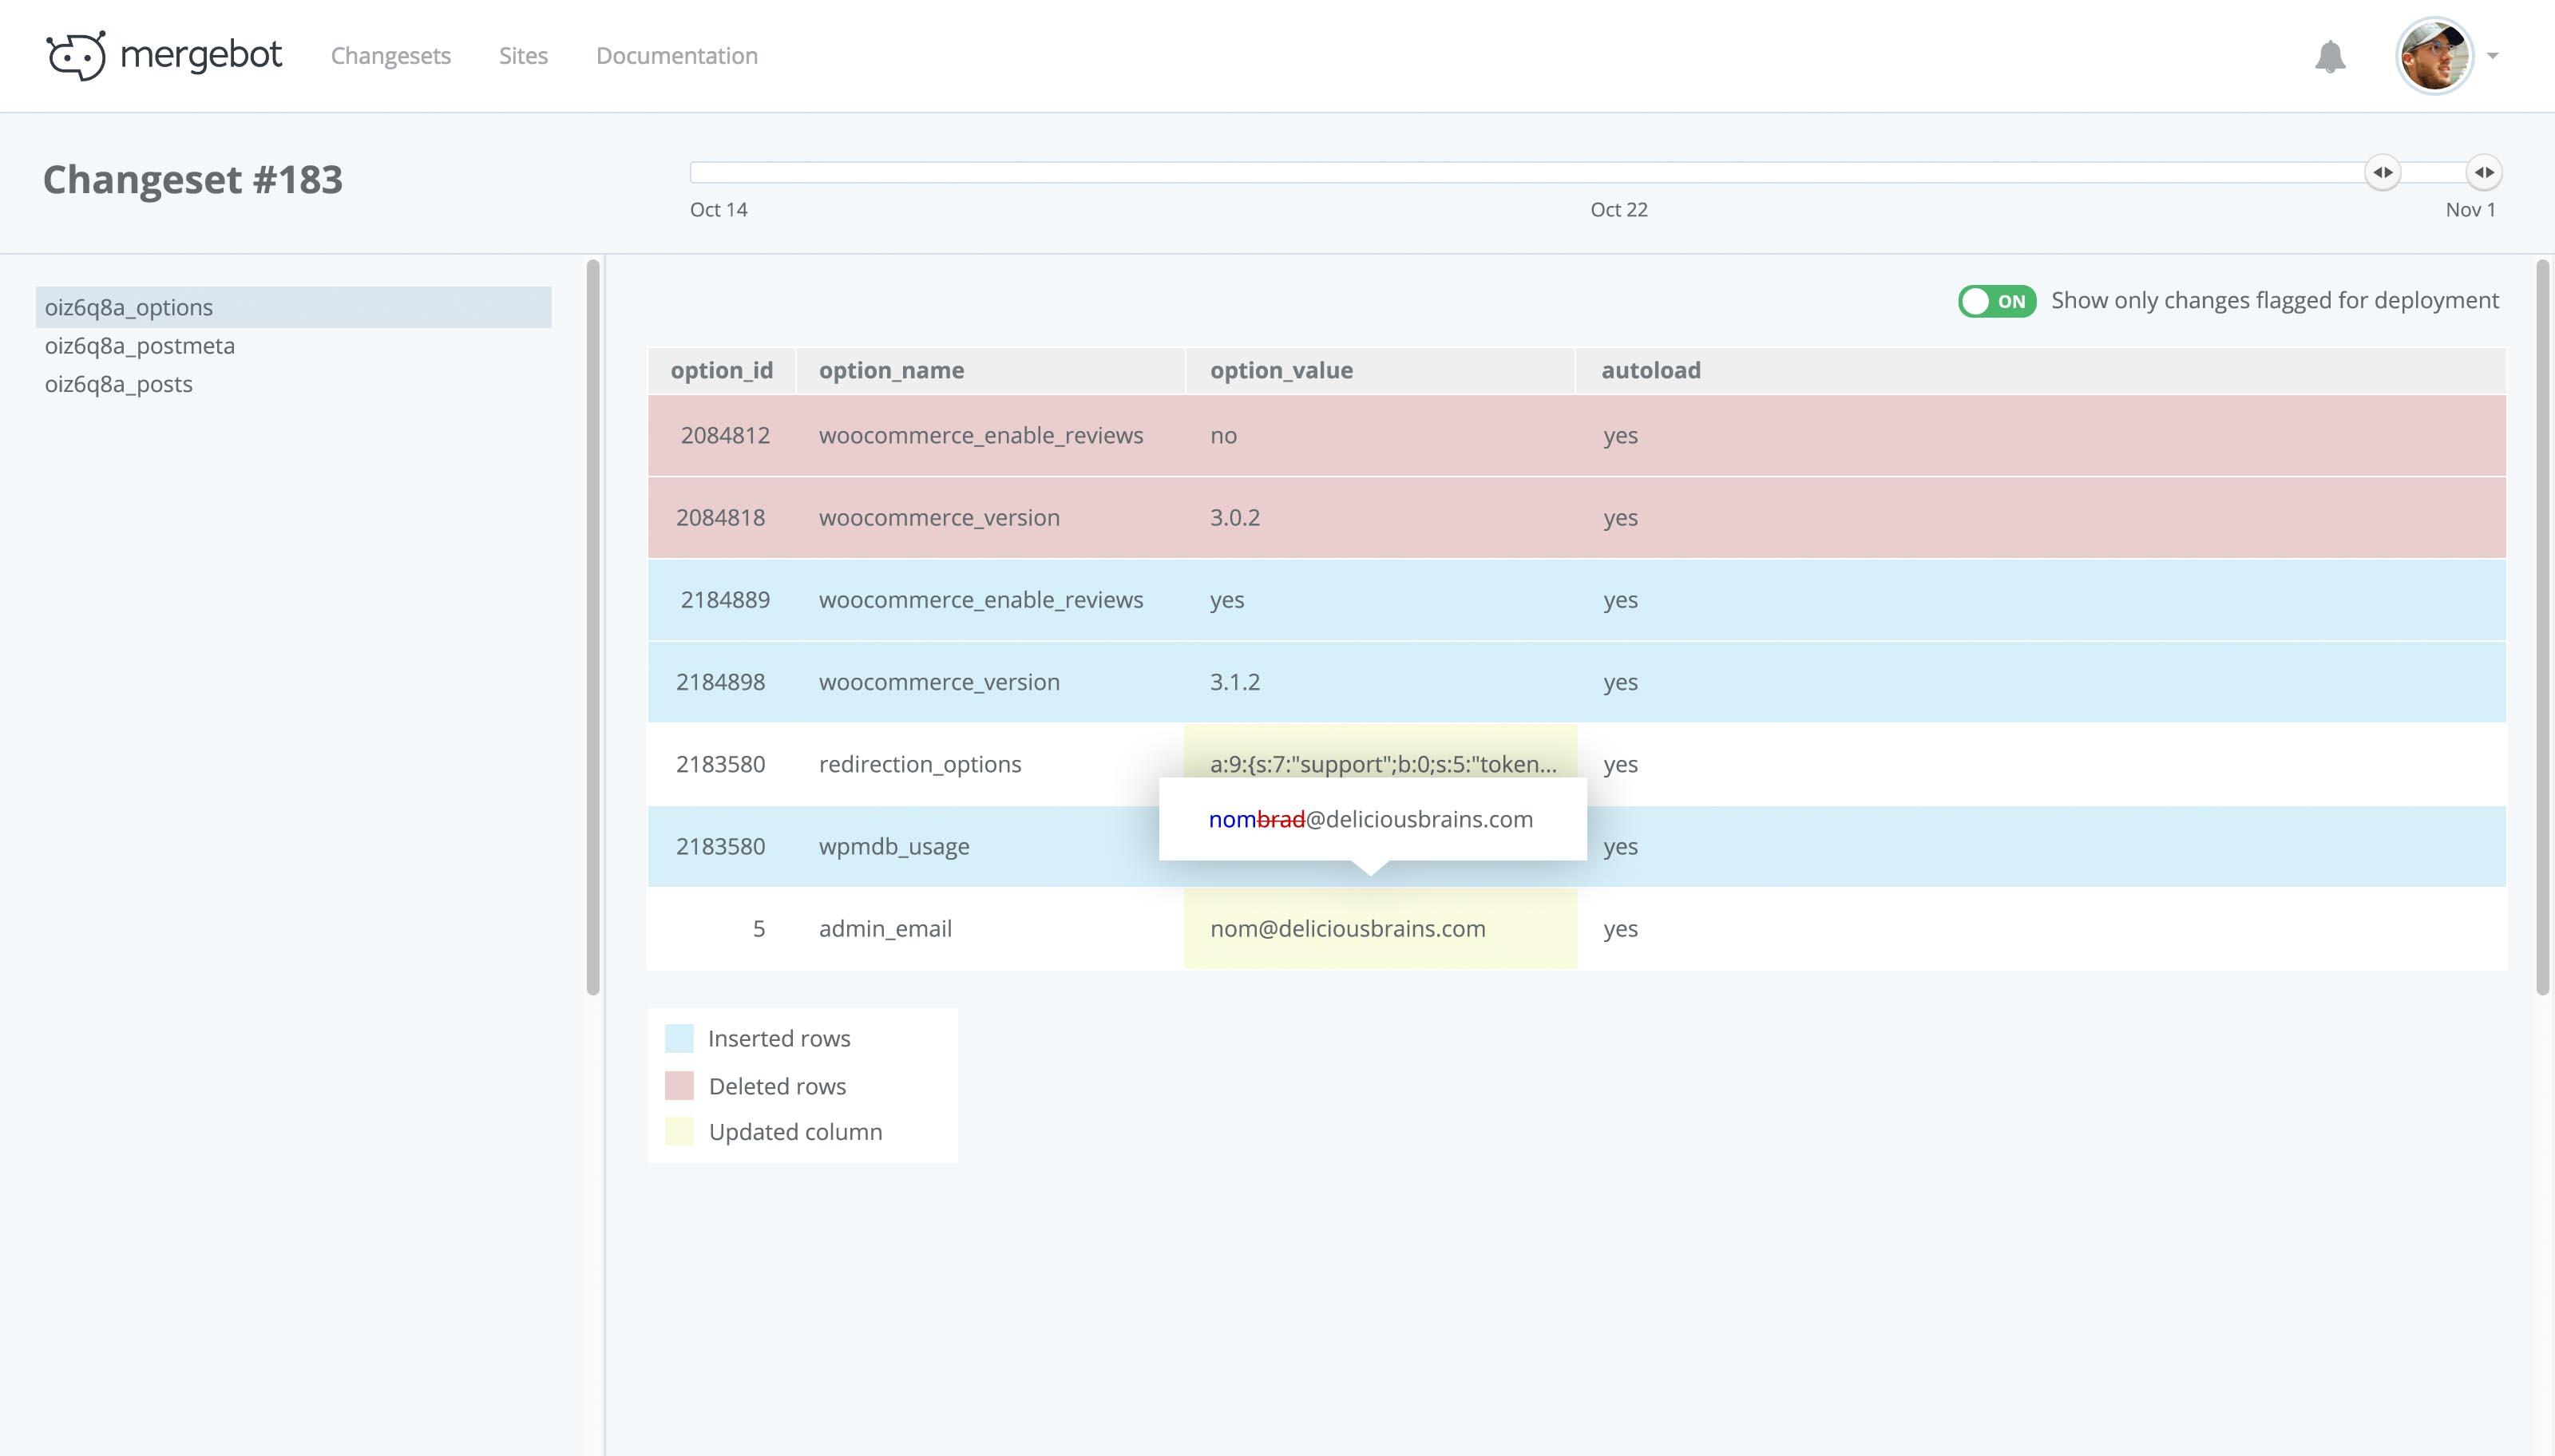 X-Ray for Mergebot mockup - visualize database changes